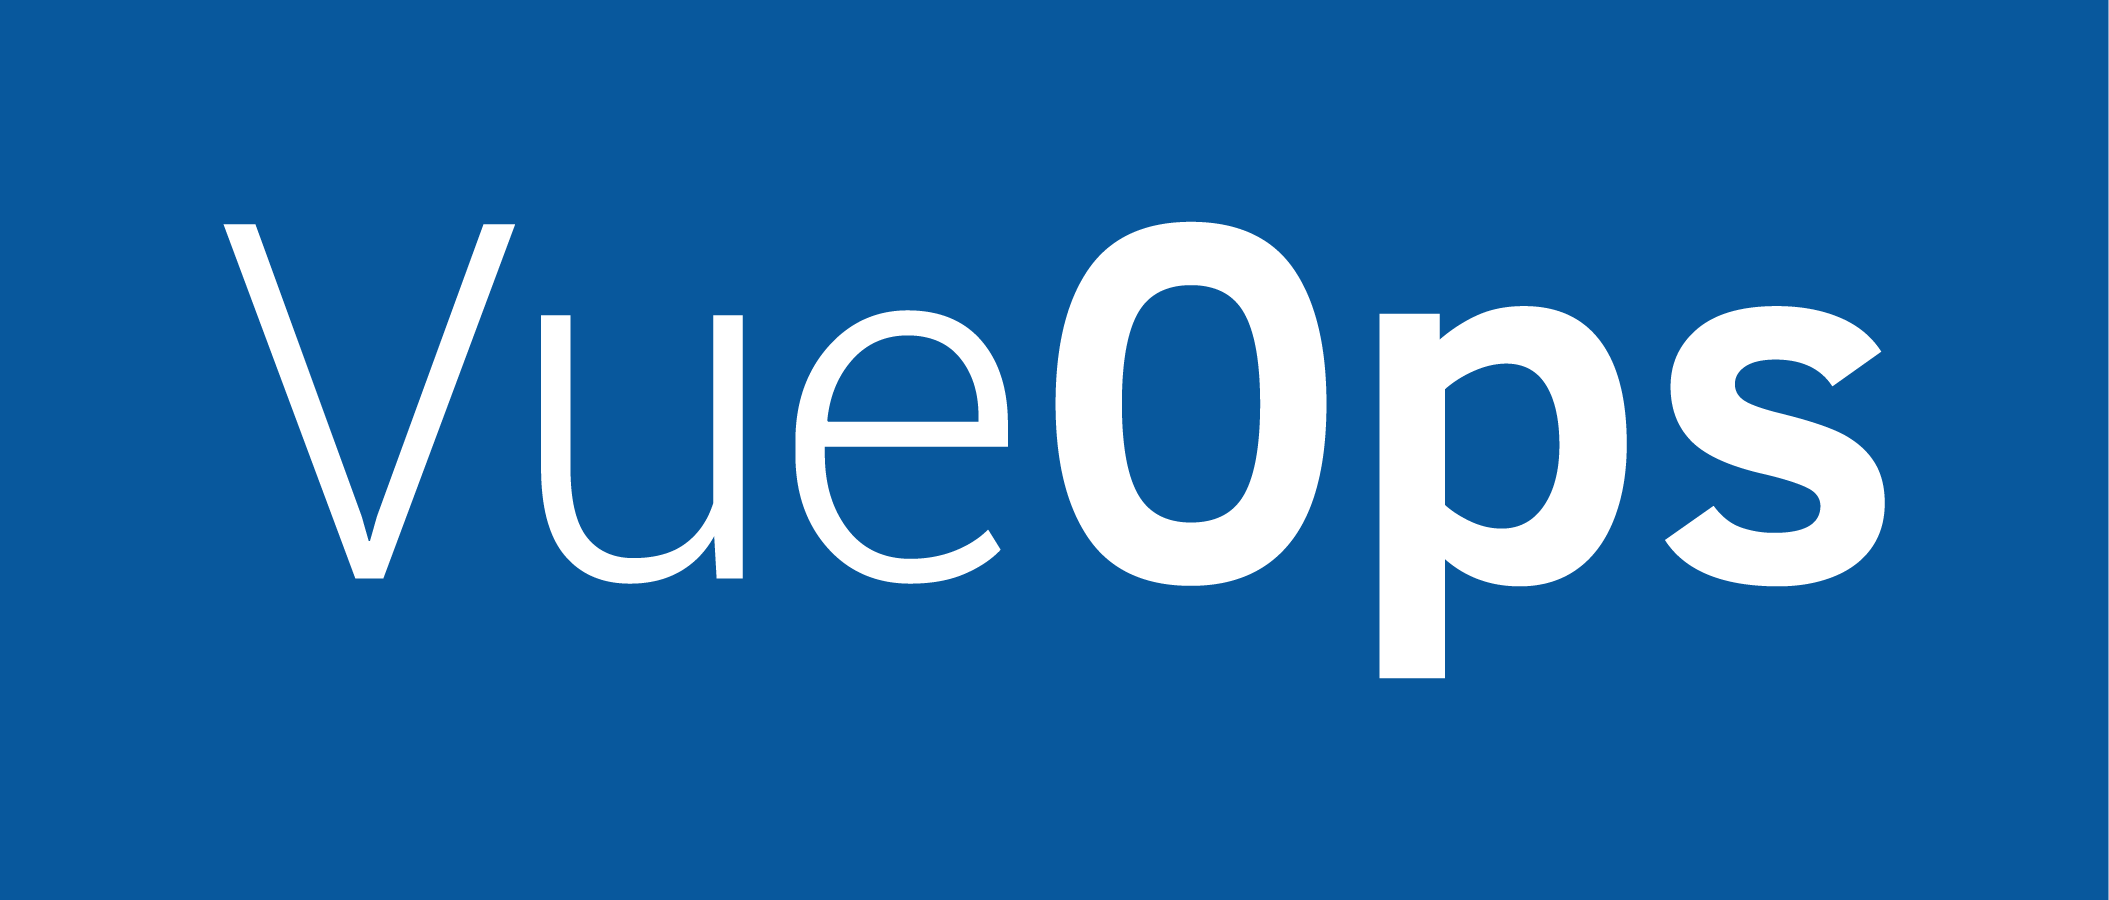 Vue Ops Logo Shape Blue